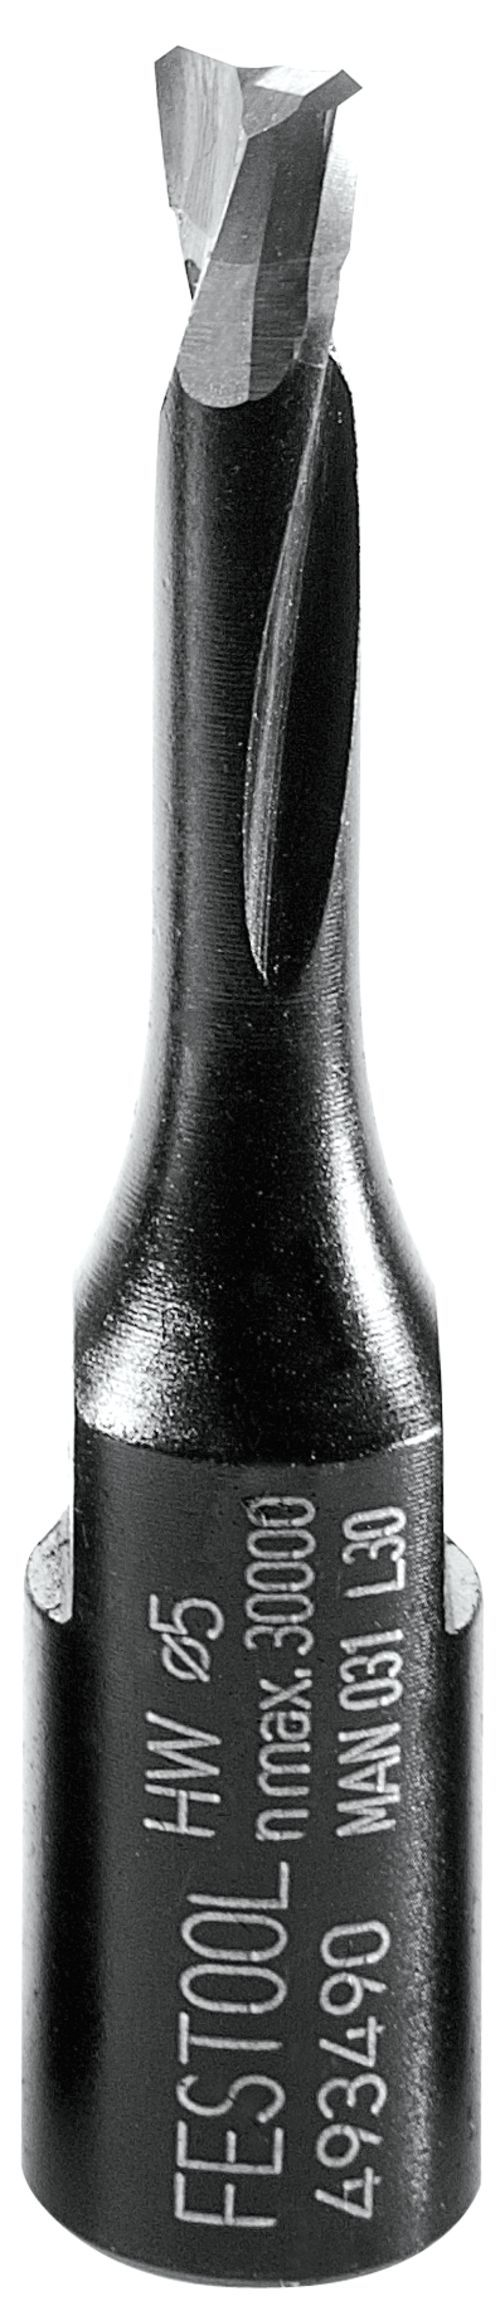 Fresa D 5-NL 20 HW-DF 500